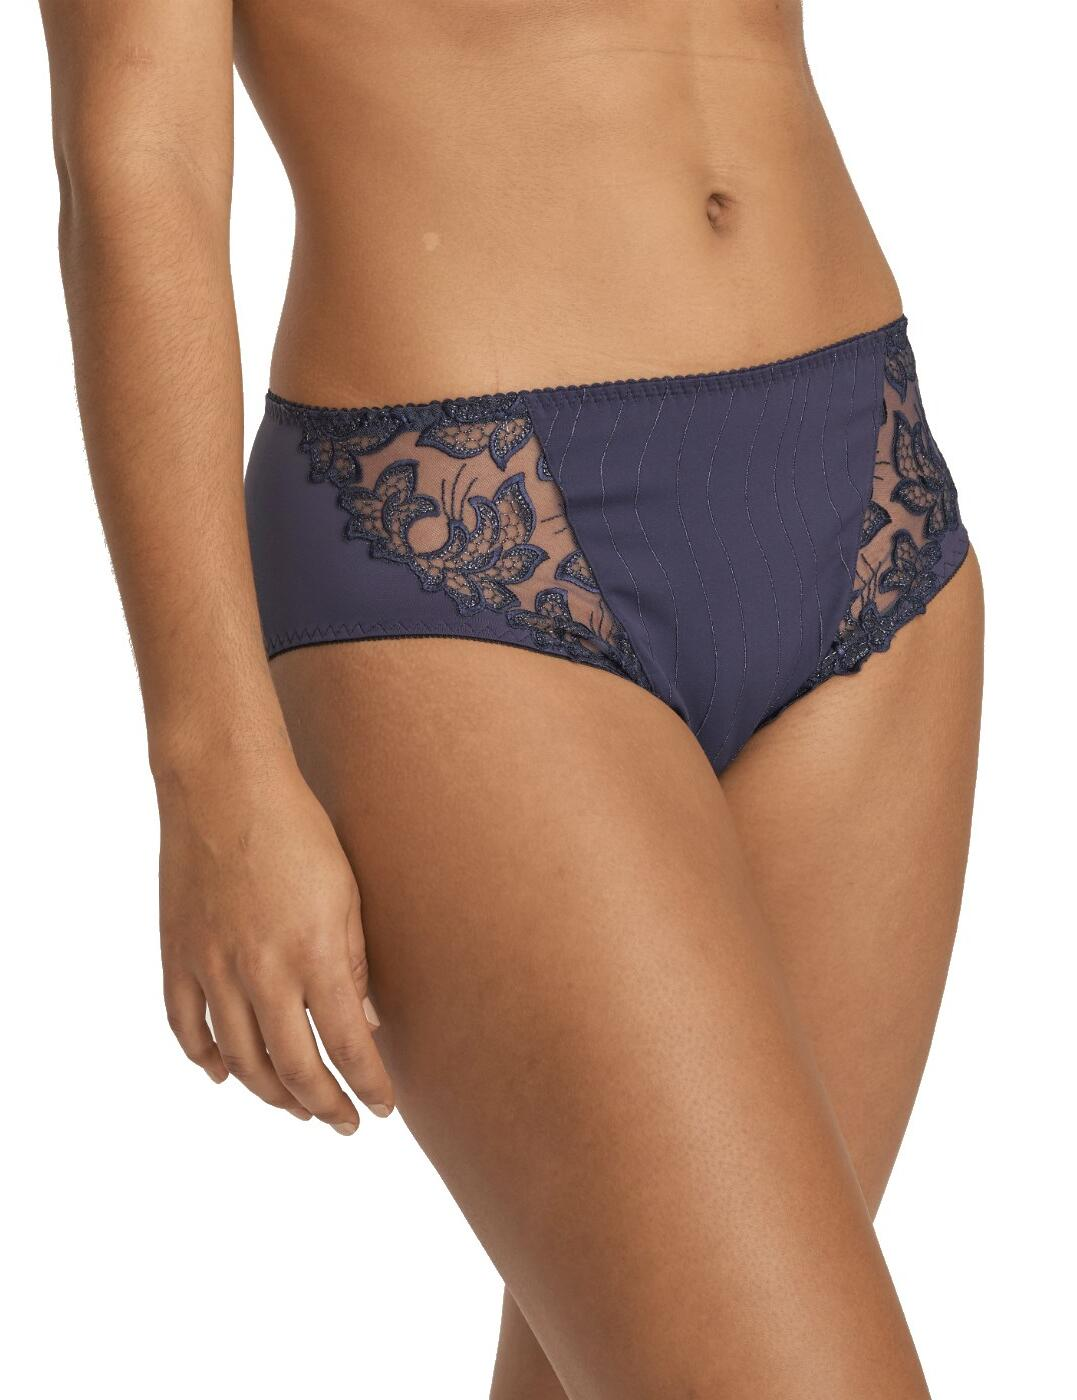 Prima-Donna-Deauville-Volle-Unterhose-Slip-Slips-Pant-0561811-Luxus-Dessous Indexbild 37